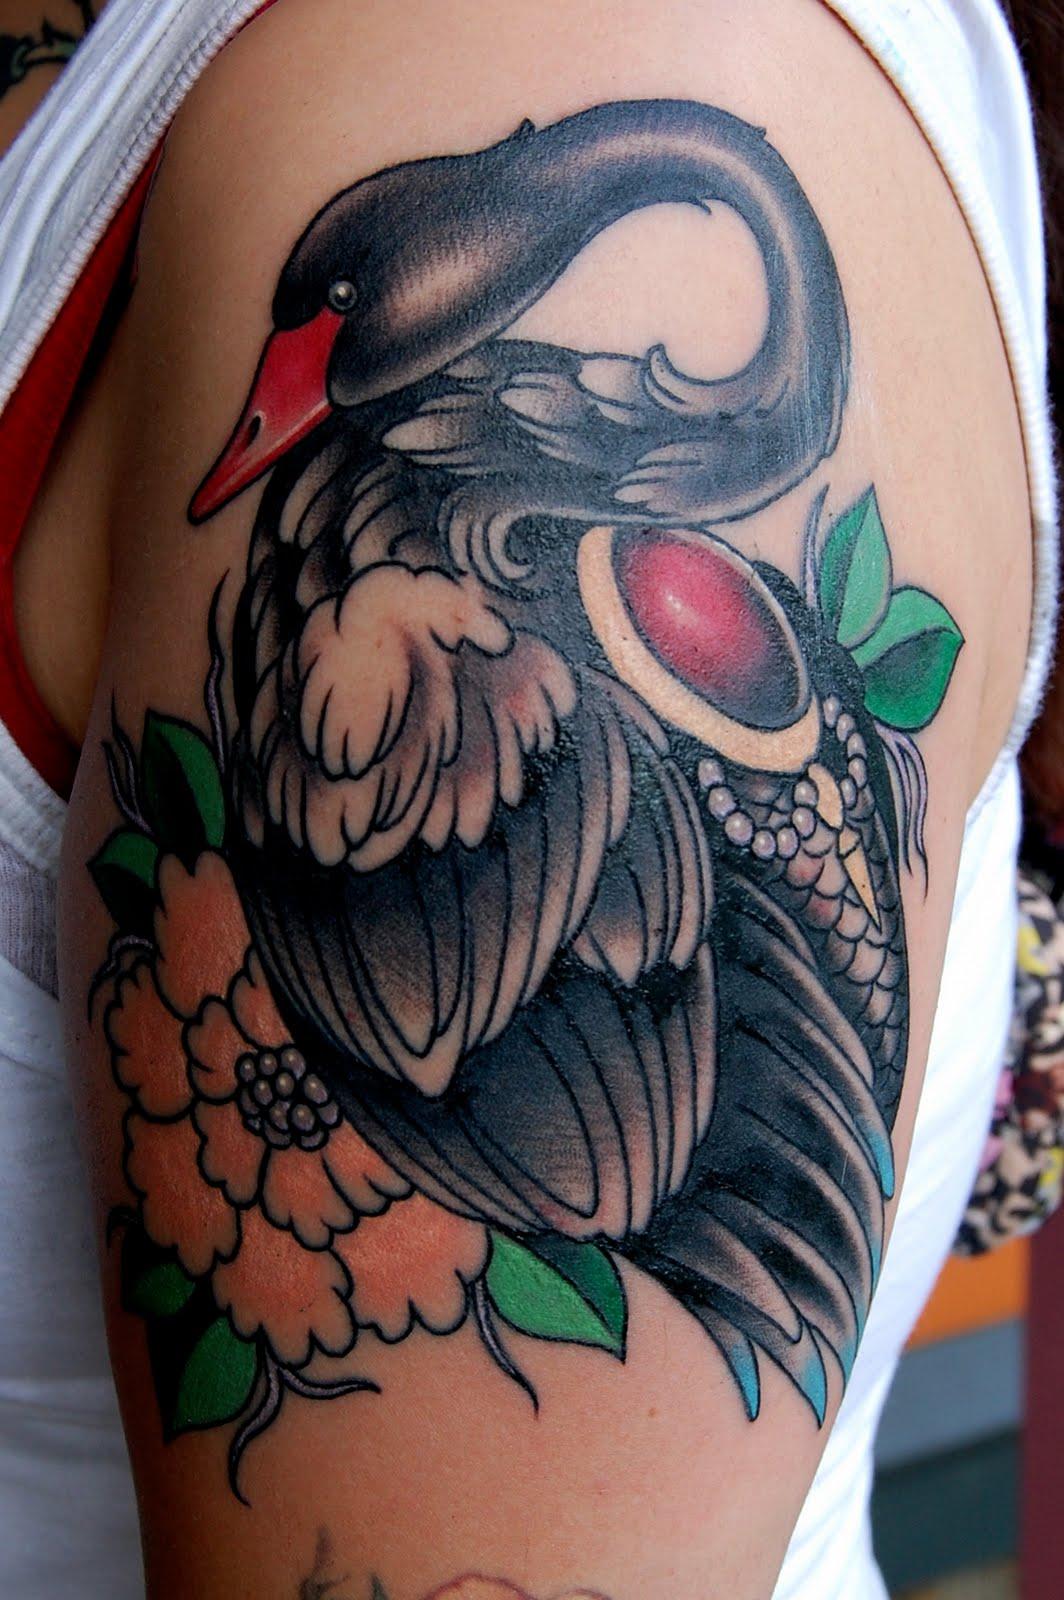 44de0d37b99af Jinxi's Interview with Neo-Traditional Tattoo Artist Jim Sylvia - Jinxi Boo  - Jinxi Boo